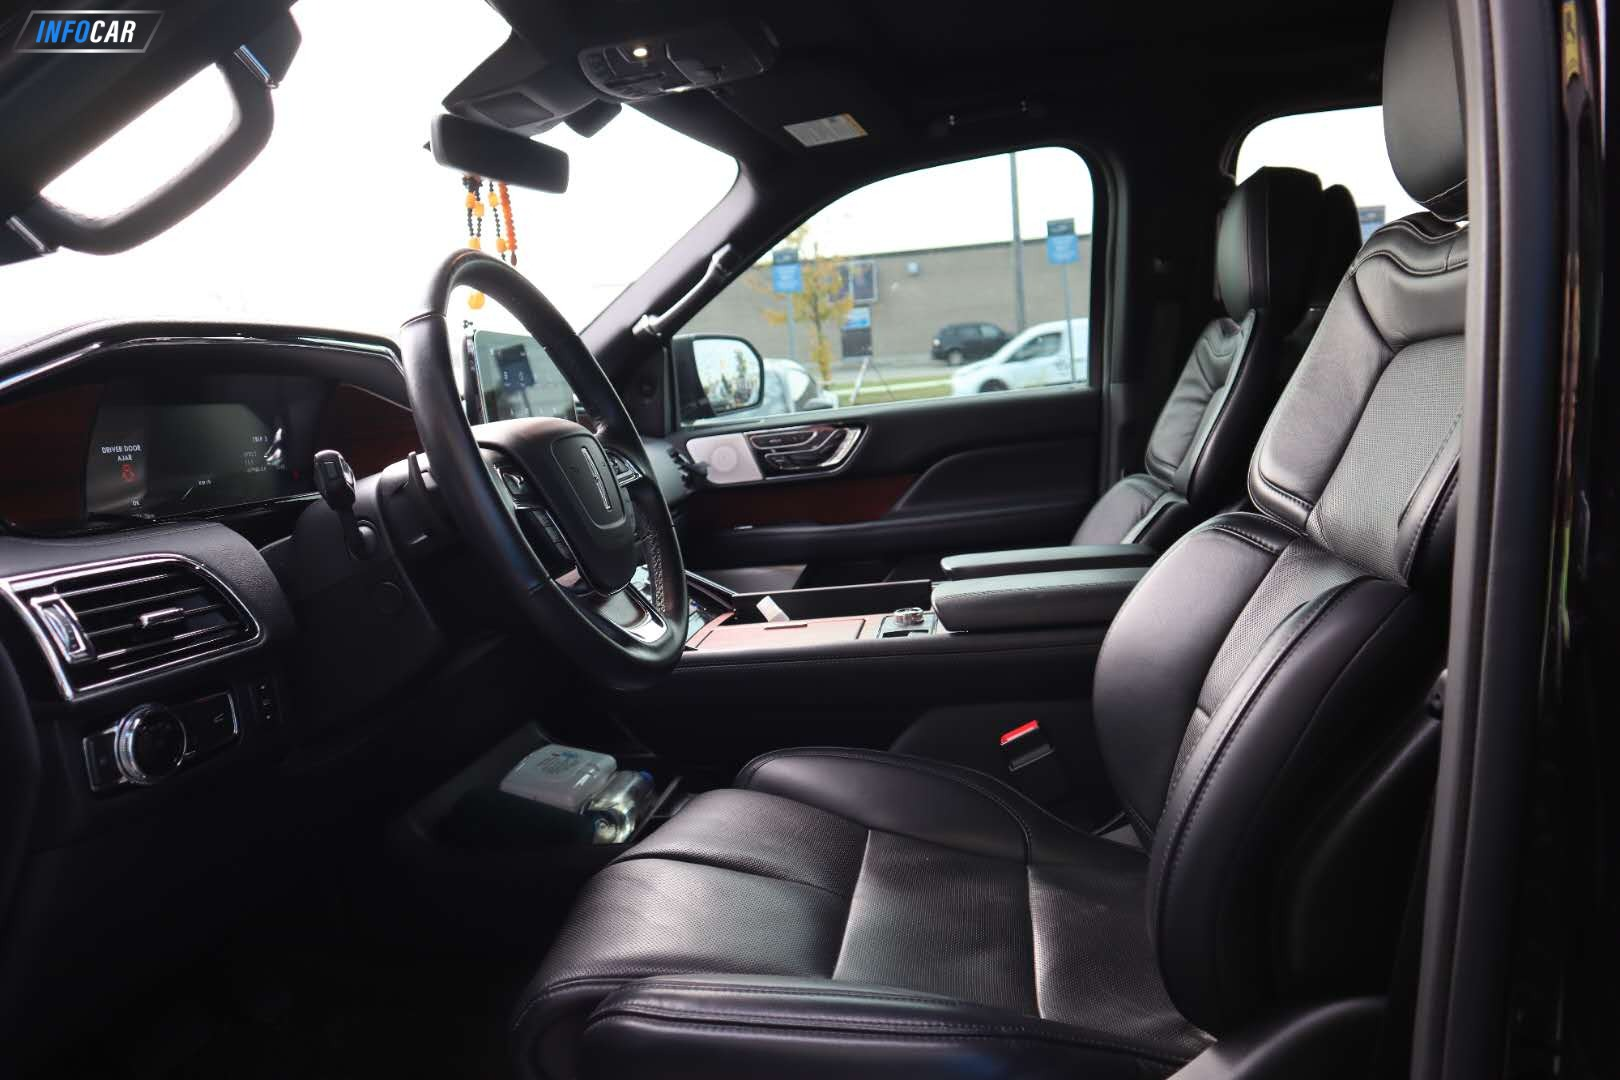 2019 Lincoln Navigator L RESERVE - INFOCAR - Toronto's Most Comprehensive New and Used Auto Trading Platform